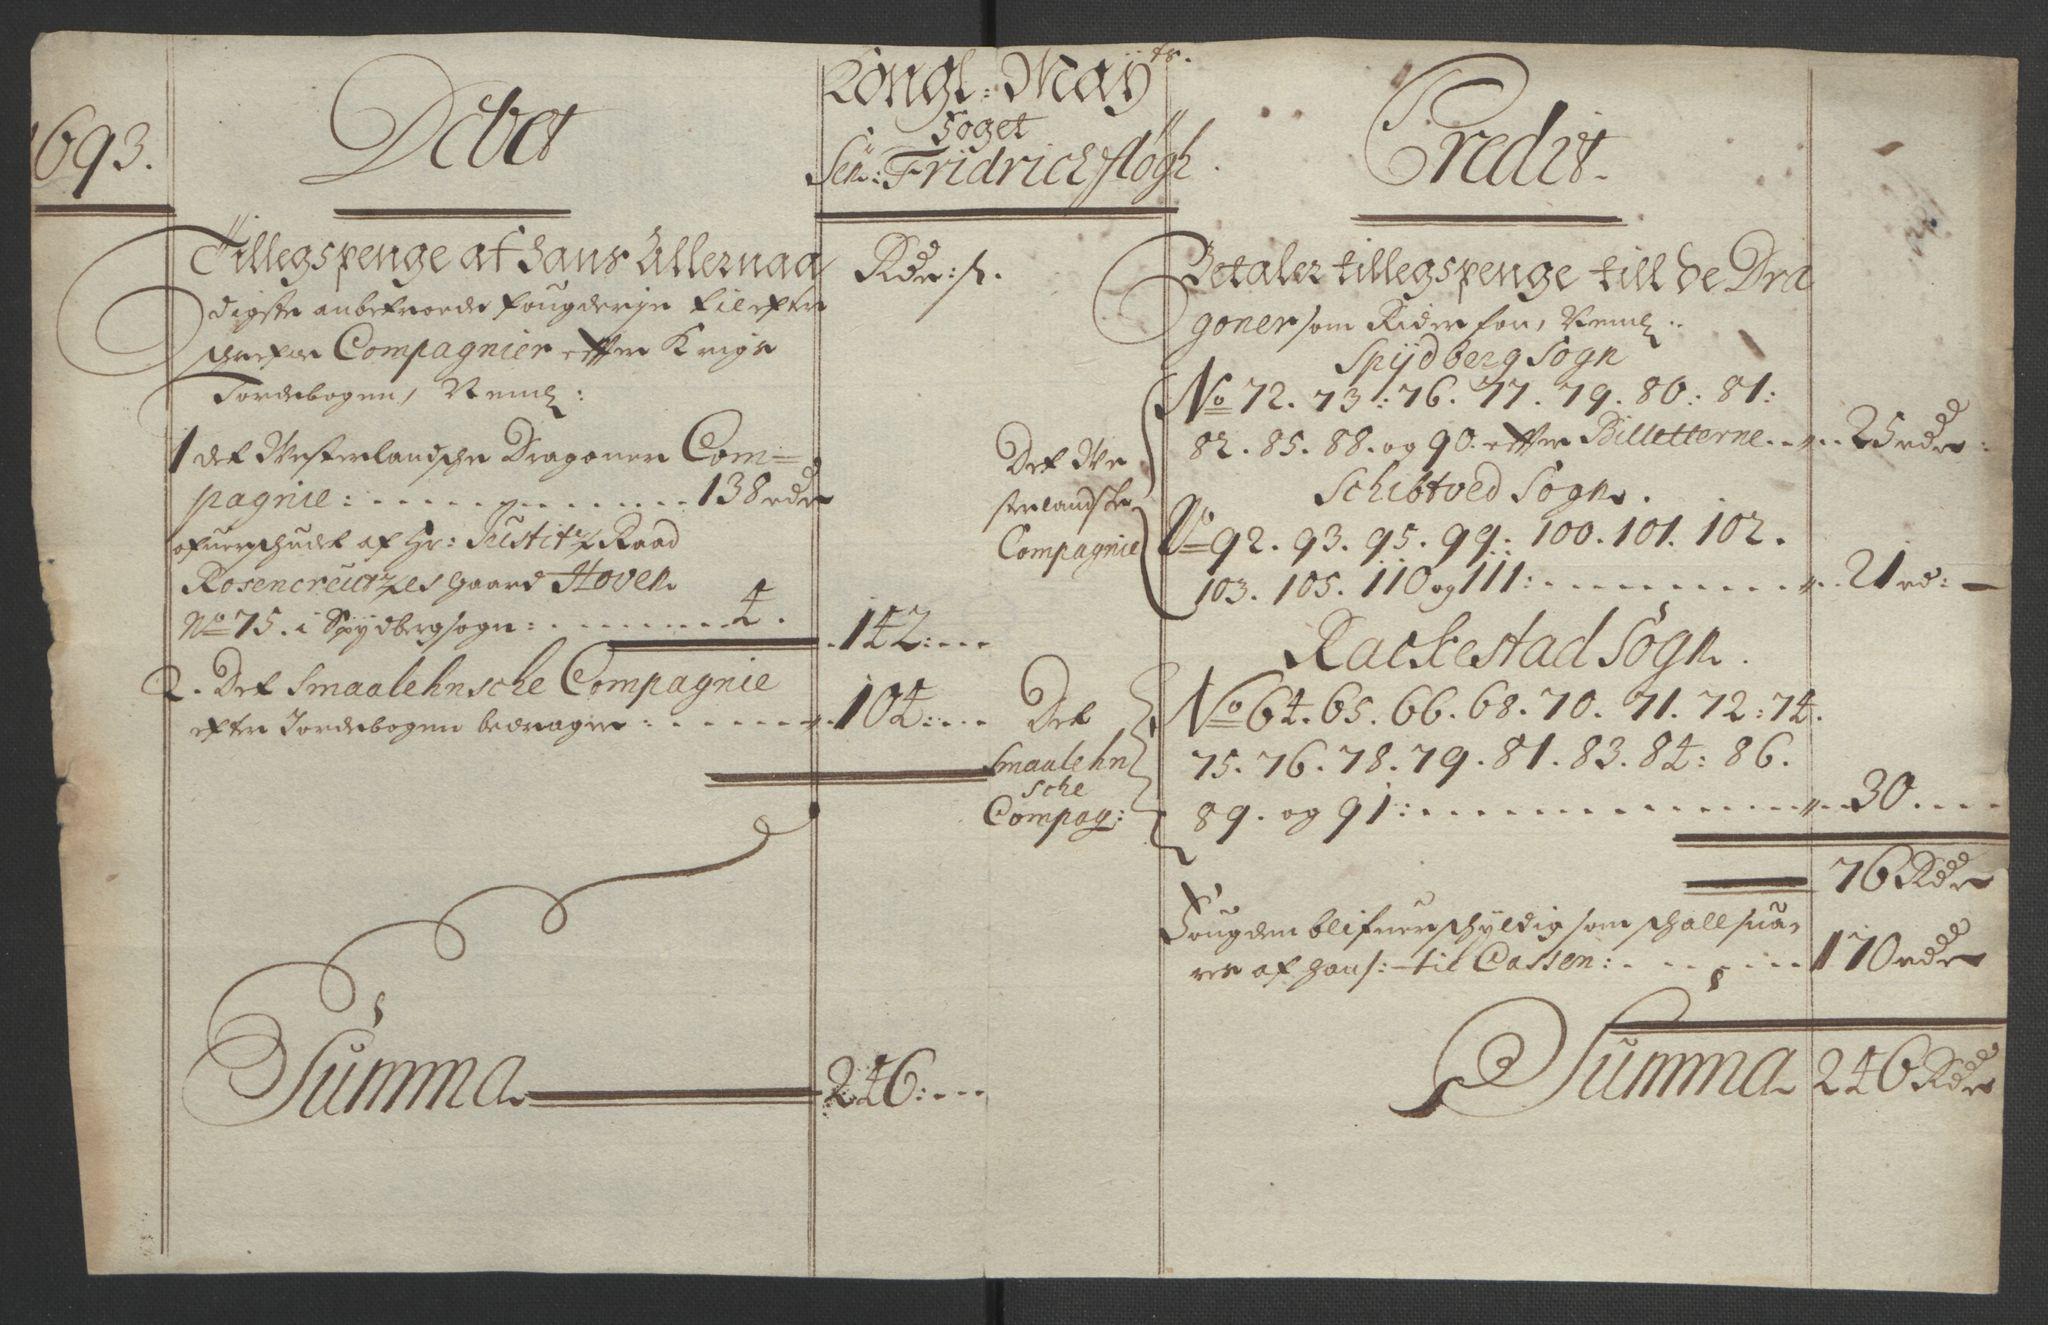 RA, Rentekammeret inntil 1814, Reviderte regnskaper, Fogderegnskap, R05/L0278: Fogderegnskap Rakkestad, 1691-1693, s. 520